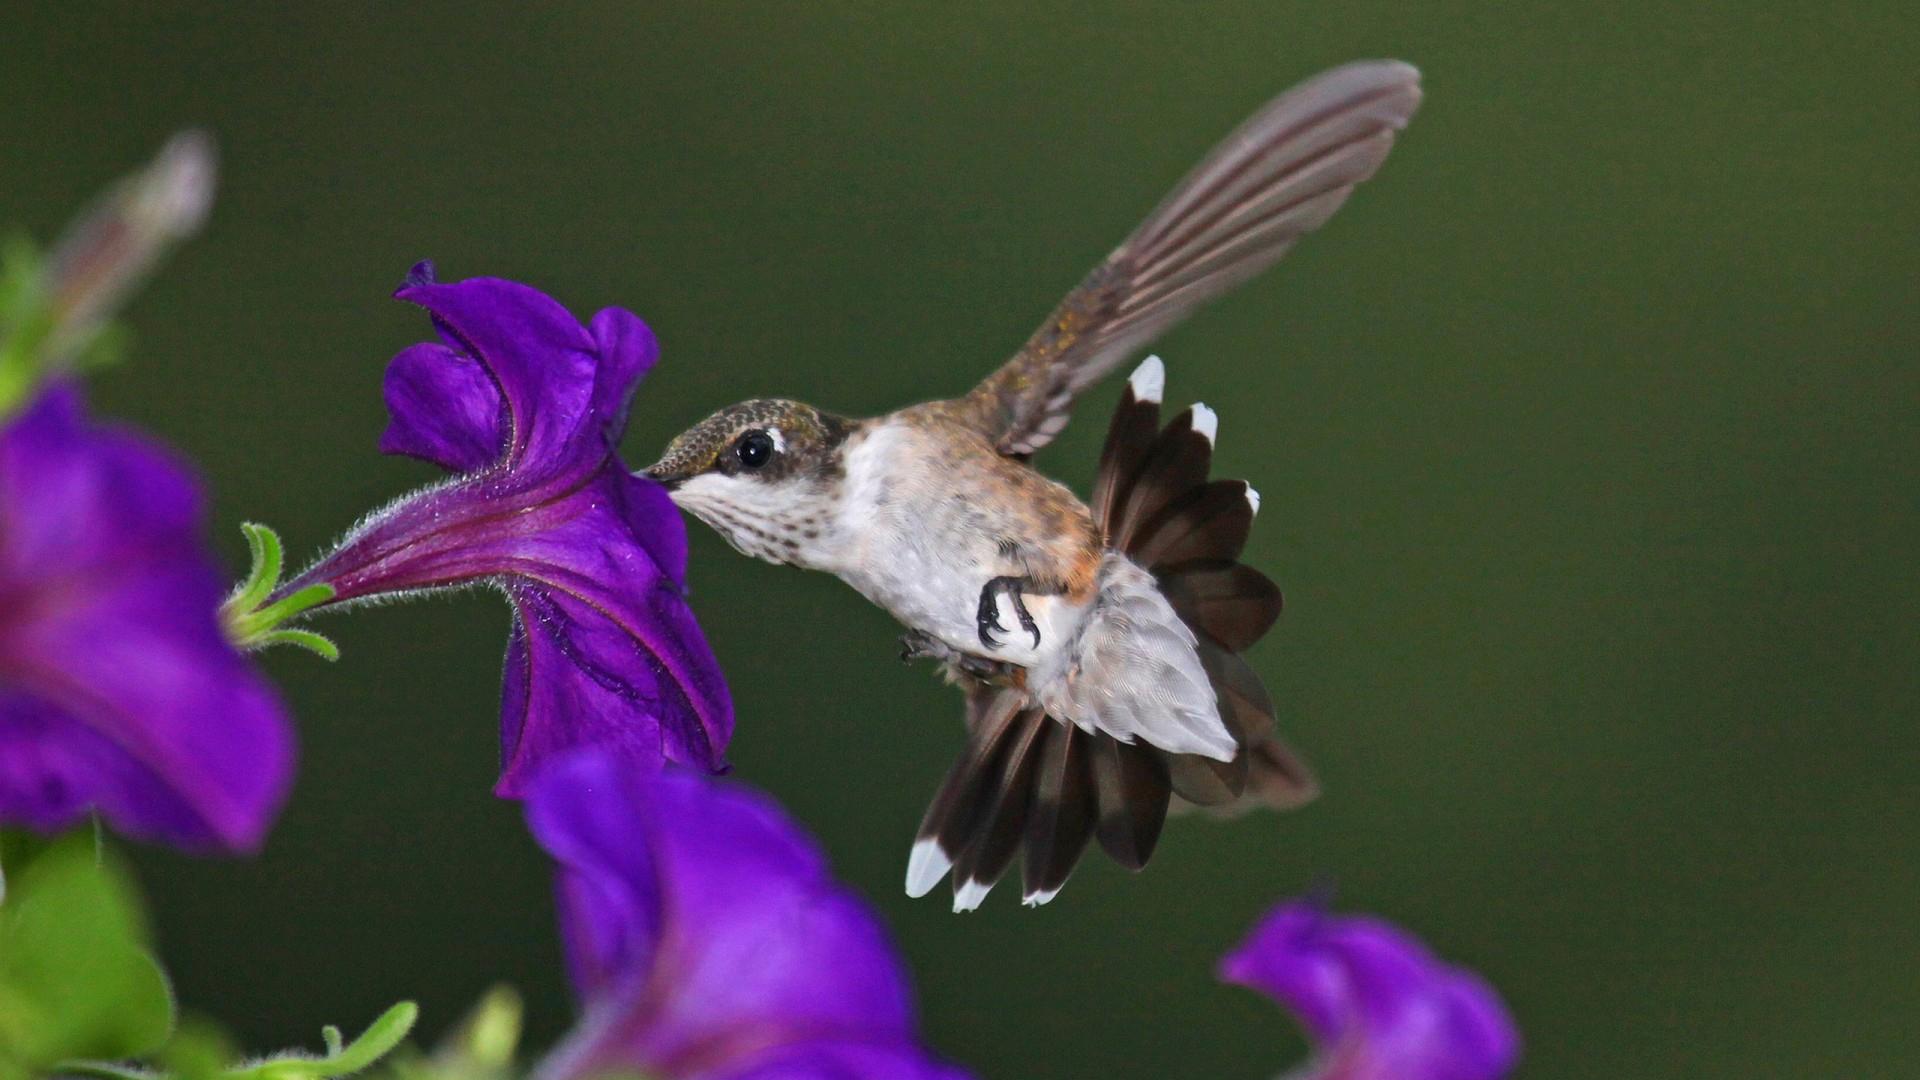 Hummingbird Wallpapers Hq